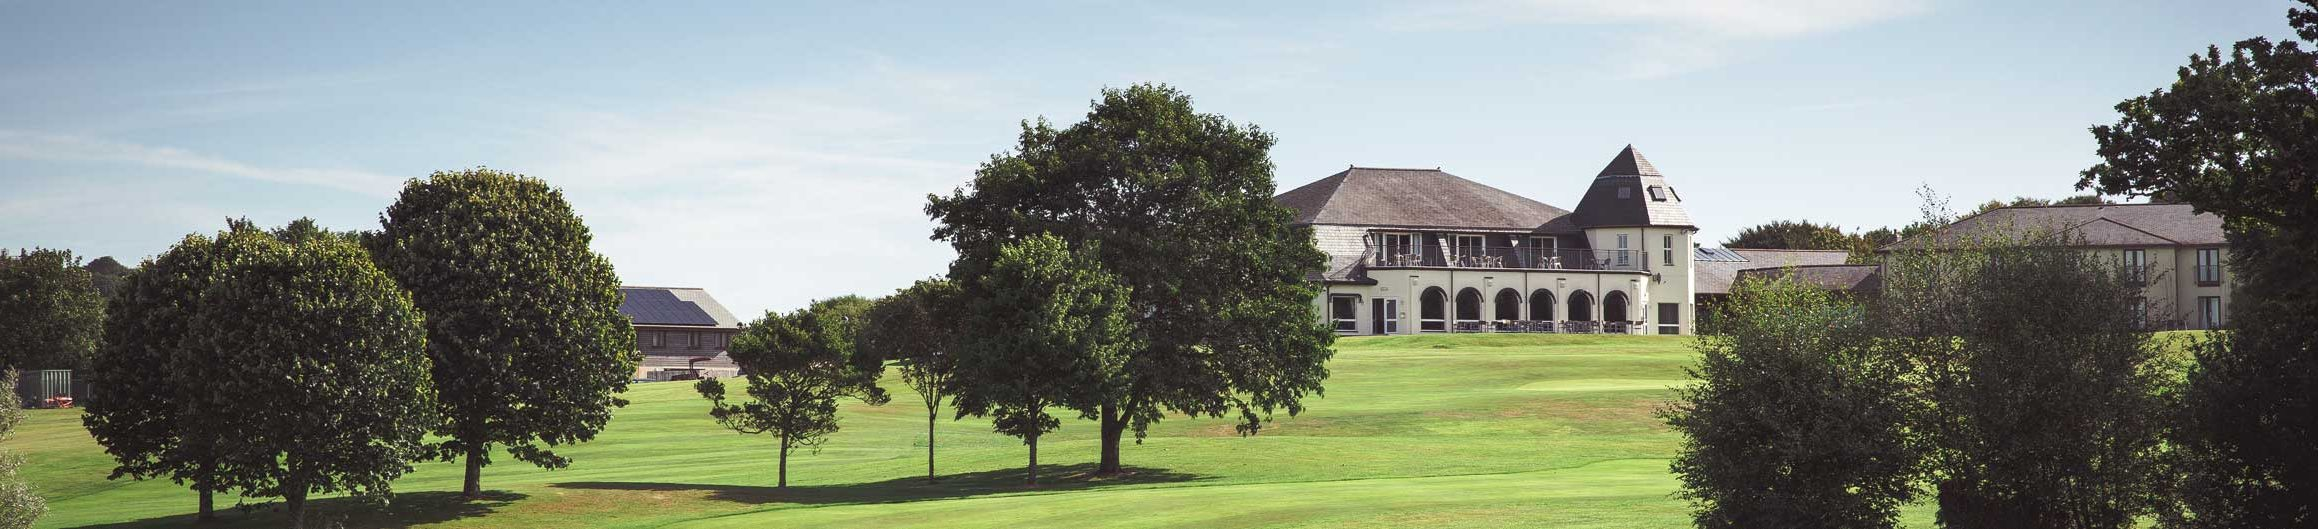 Lanhydrock Hotel Golfcourse